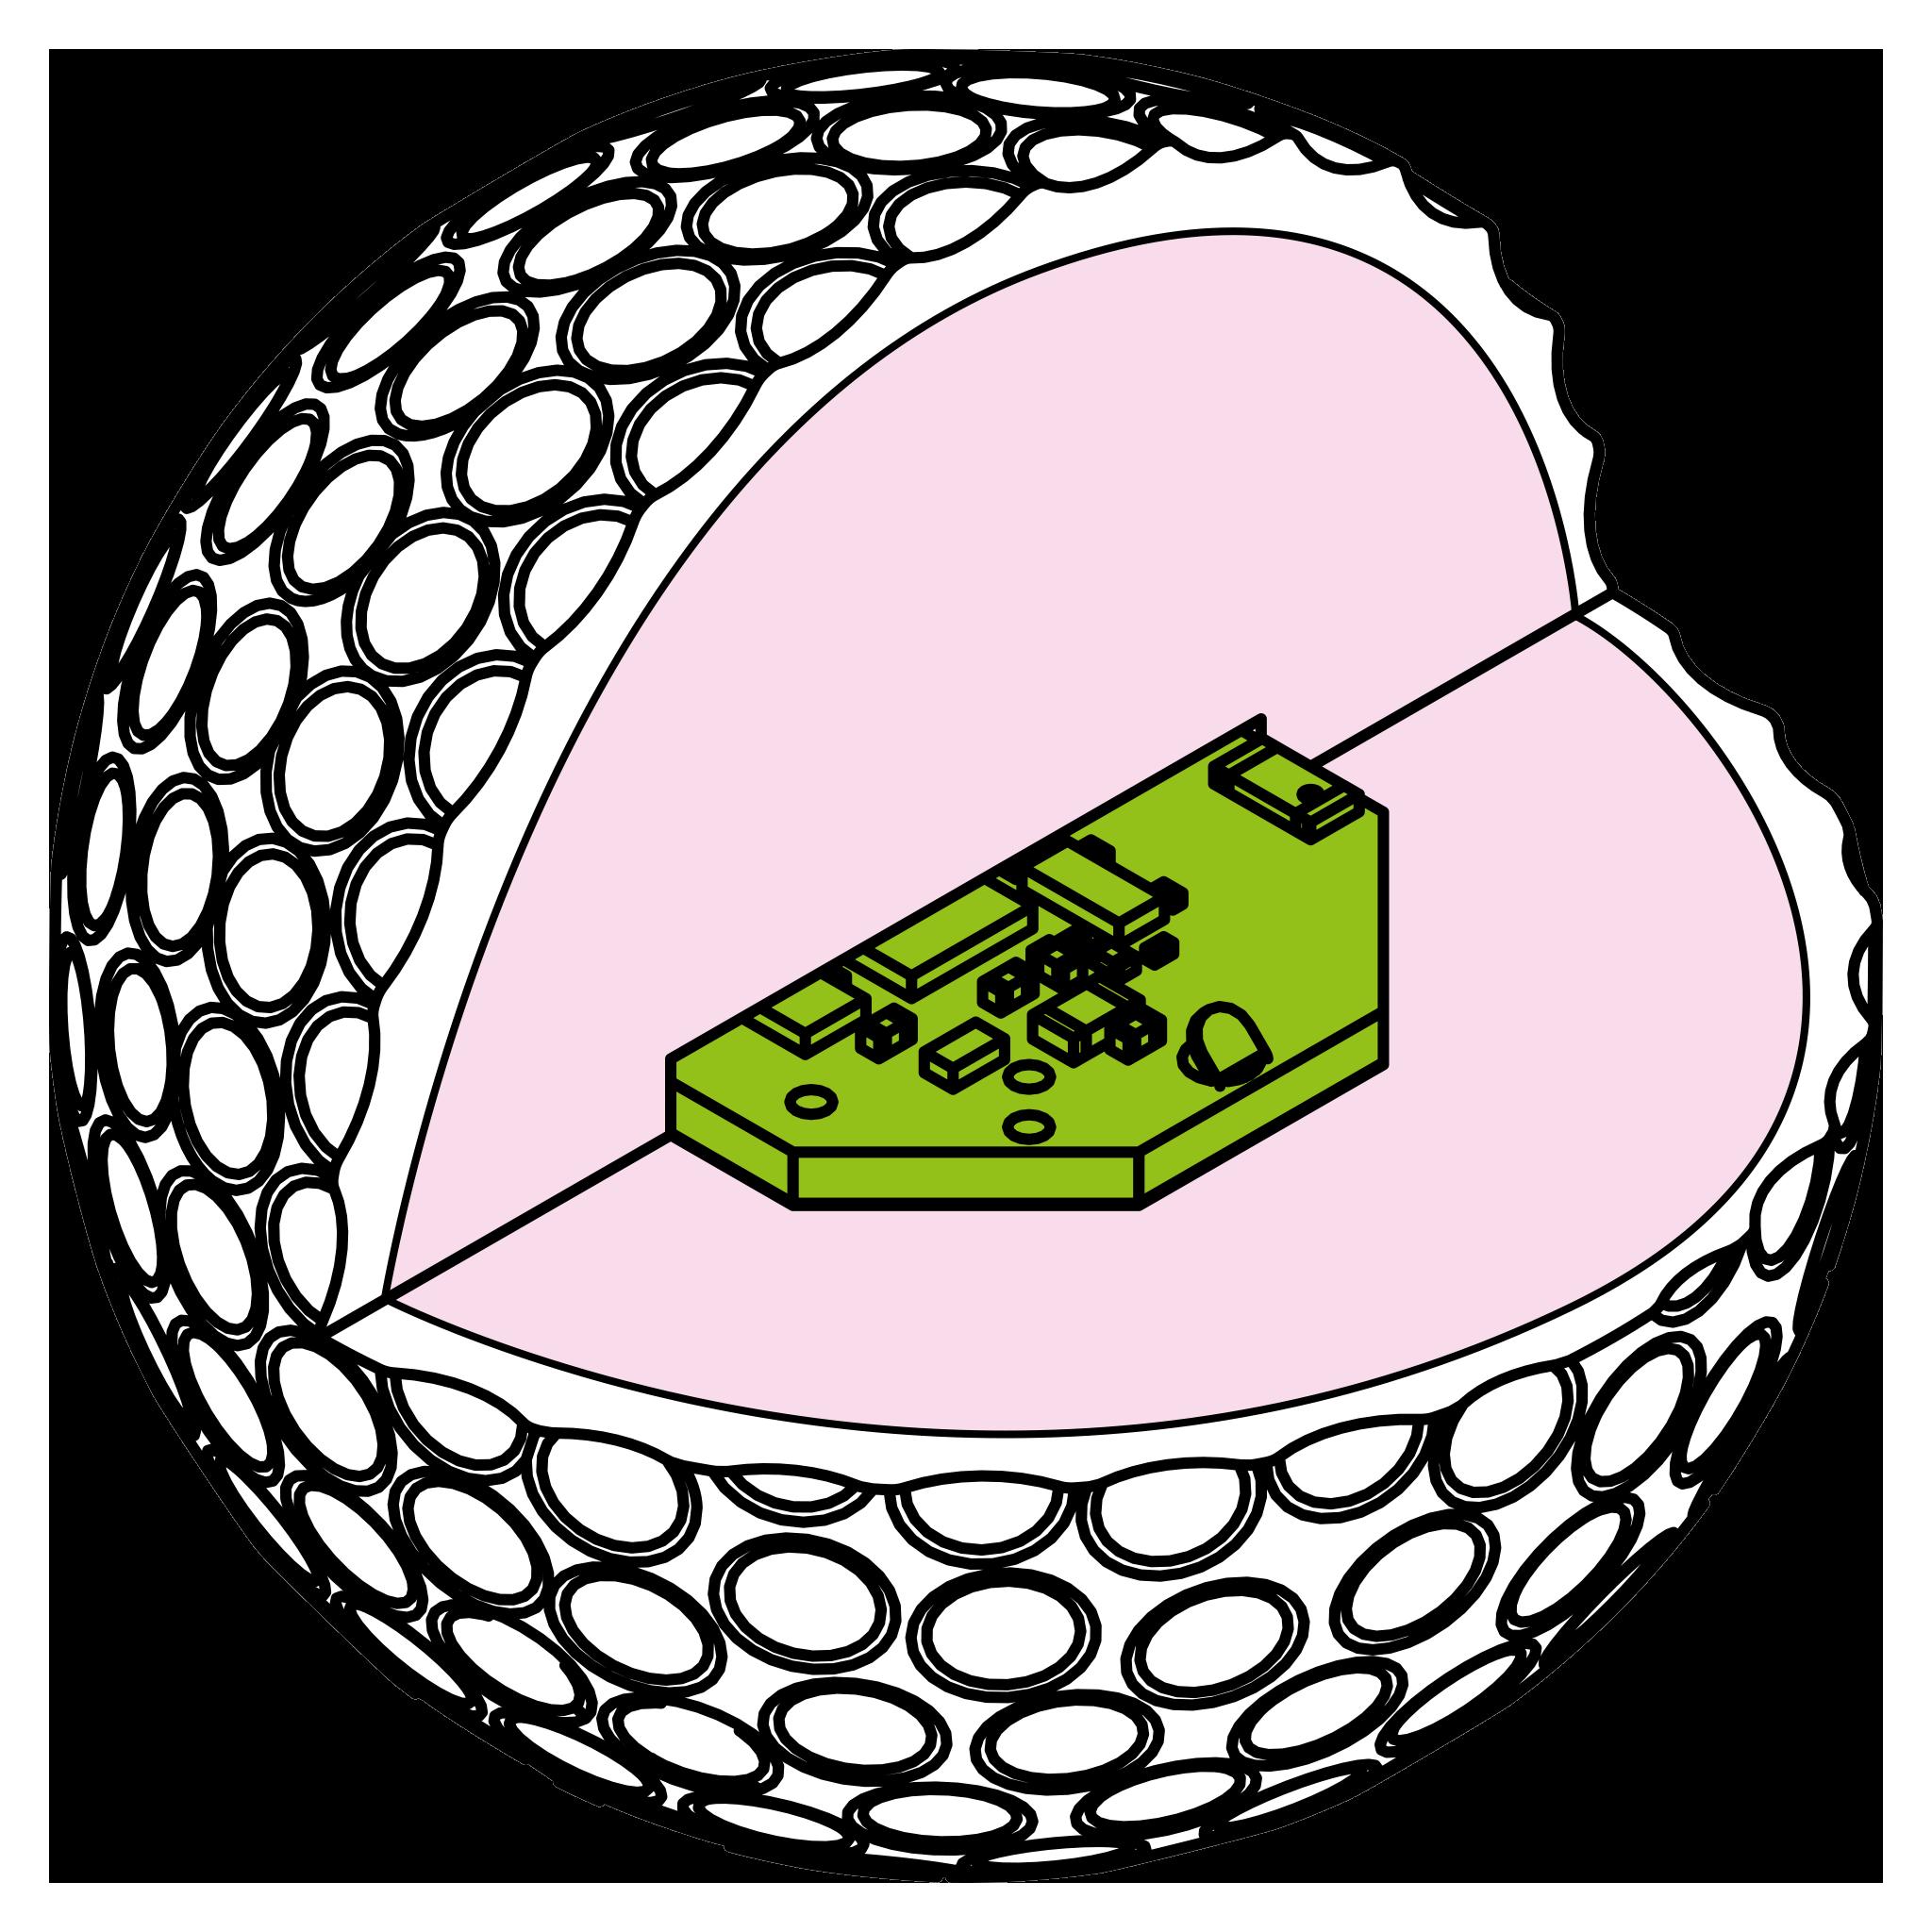 Golfer clipart pencil drawing. Golf ball at getdrawings